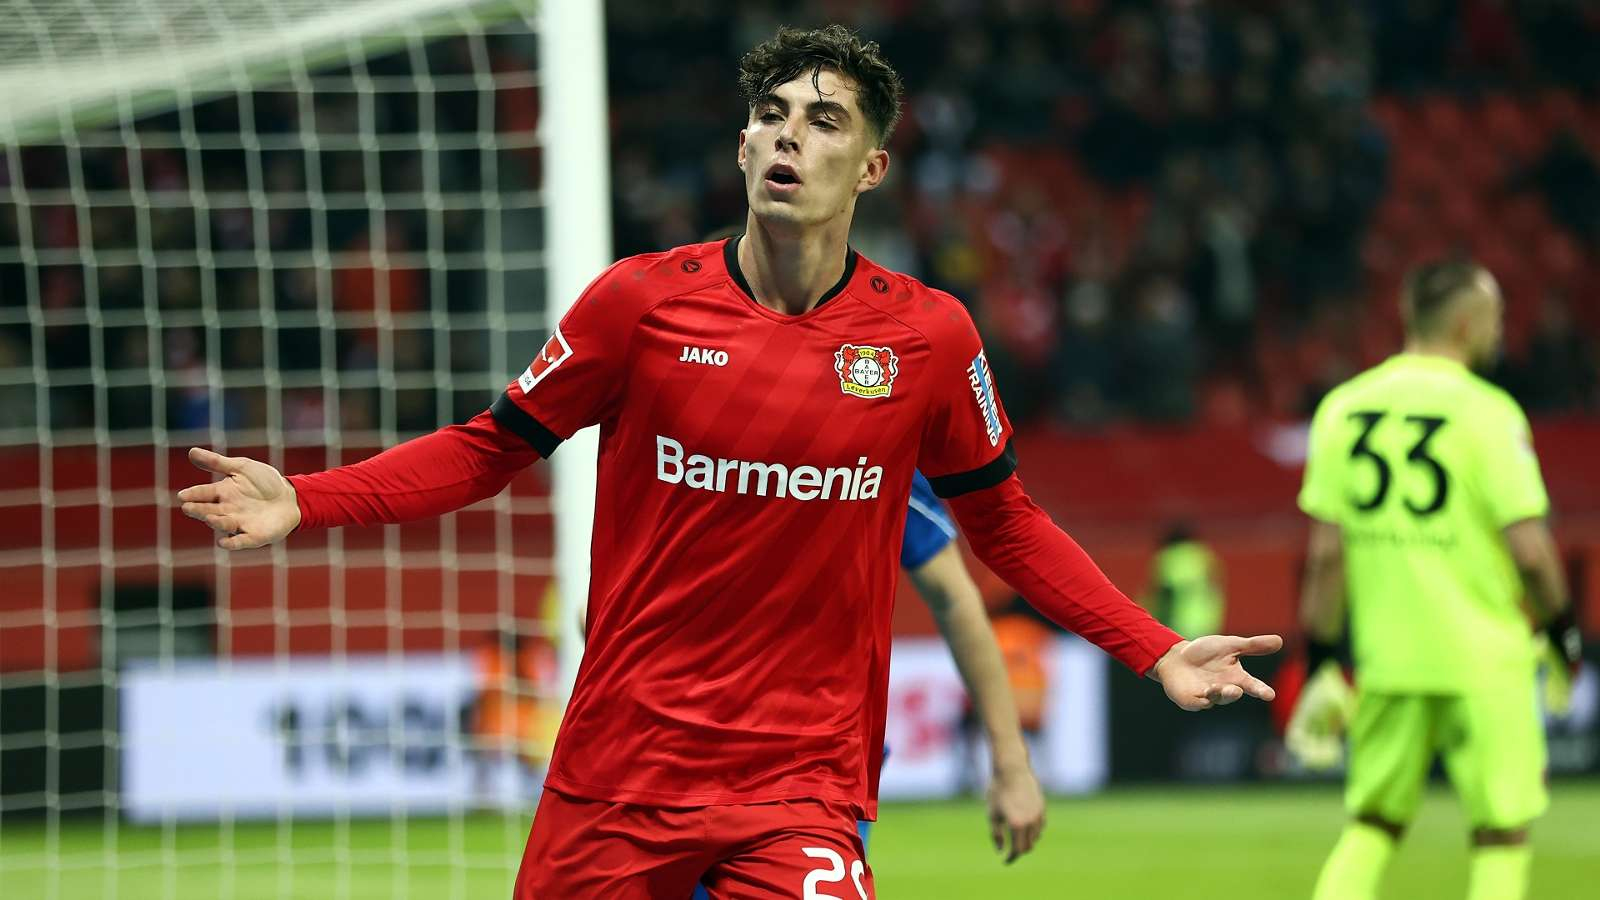 Kai Havertz Bayer Leverkusen 2019-20